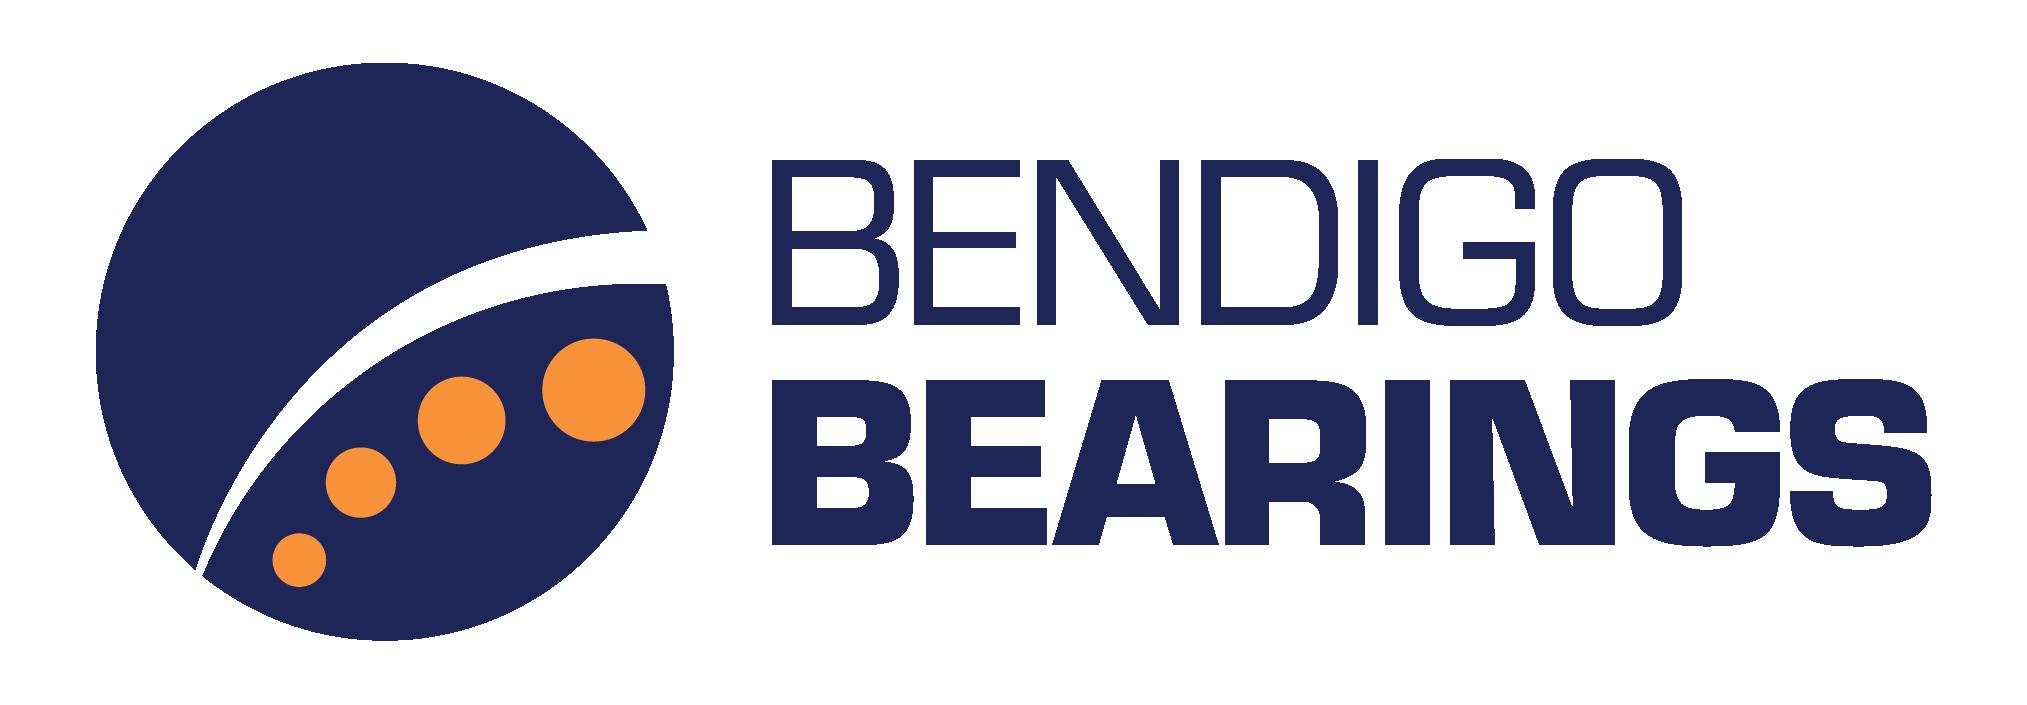 Bendigo Bearings - We'll Keep You Rolling